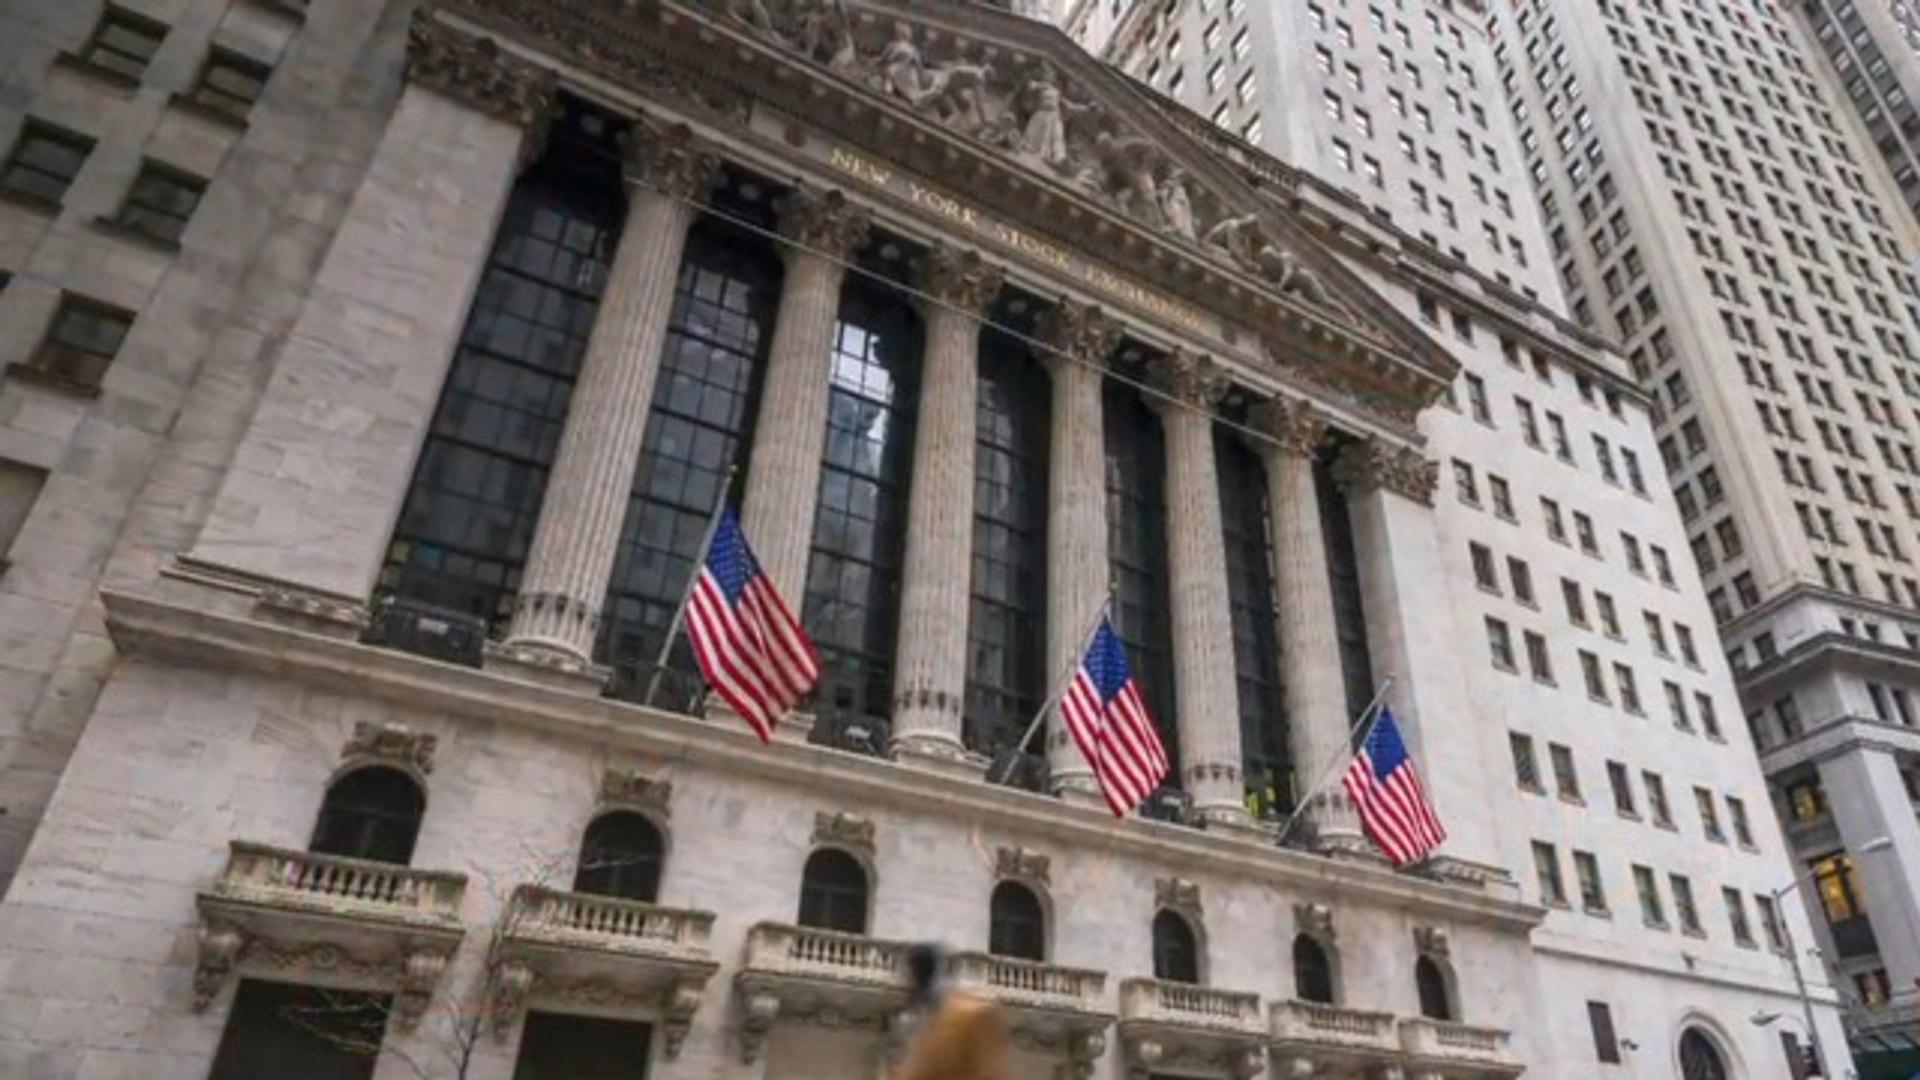 Wall Street bonuses outpace minimum wage